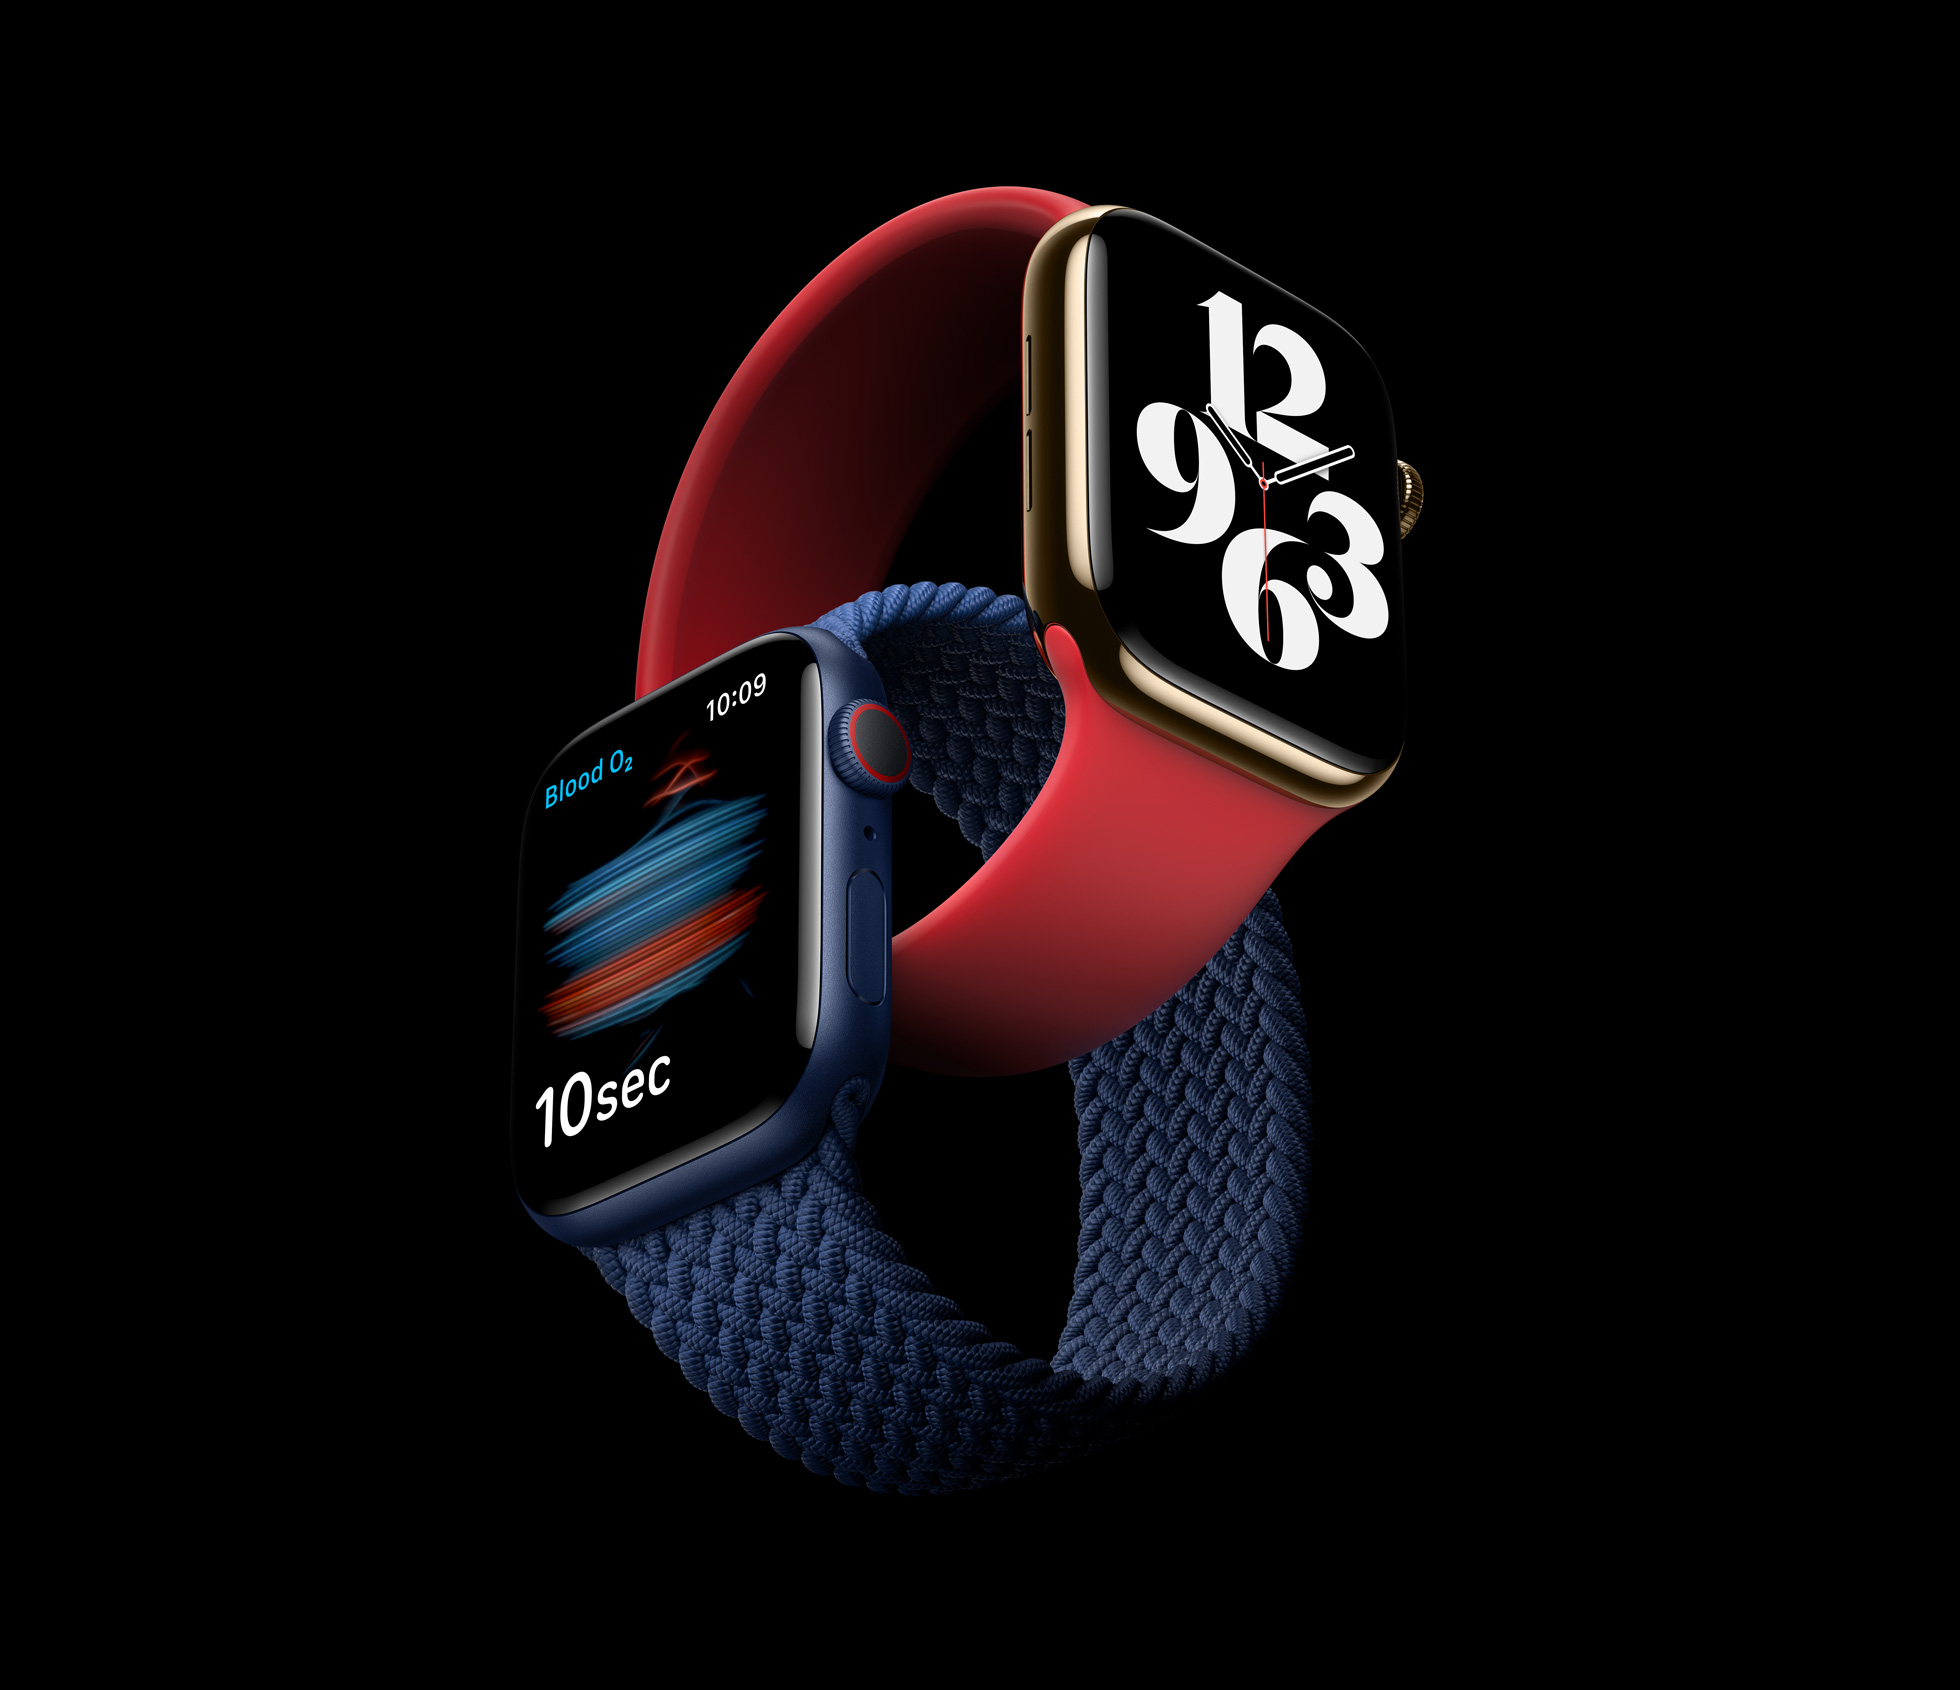 https://www.apple.com/newsroom/images/product/watch/standard/Apple_delivers-apple-watch-series-6_09152020_big.jpg.large_2x.jpg